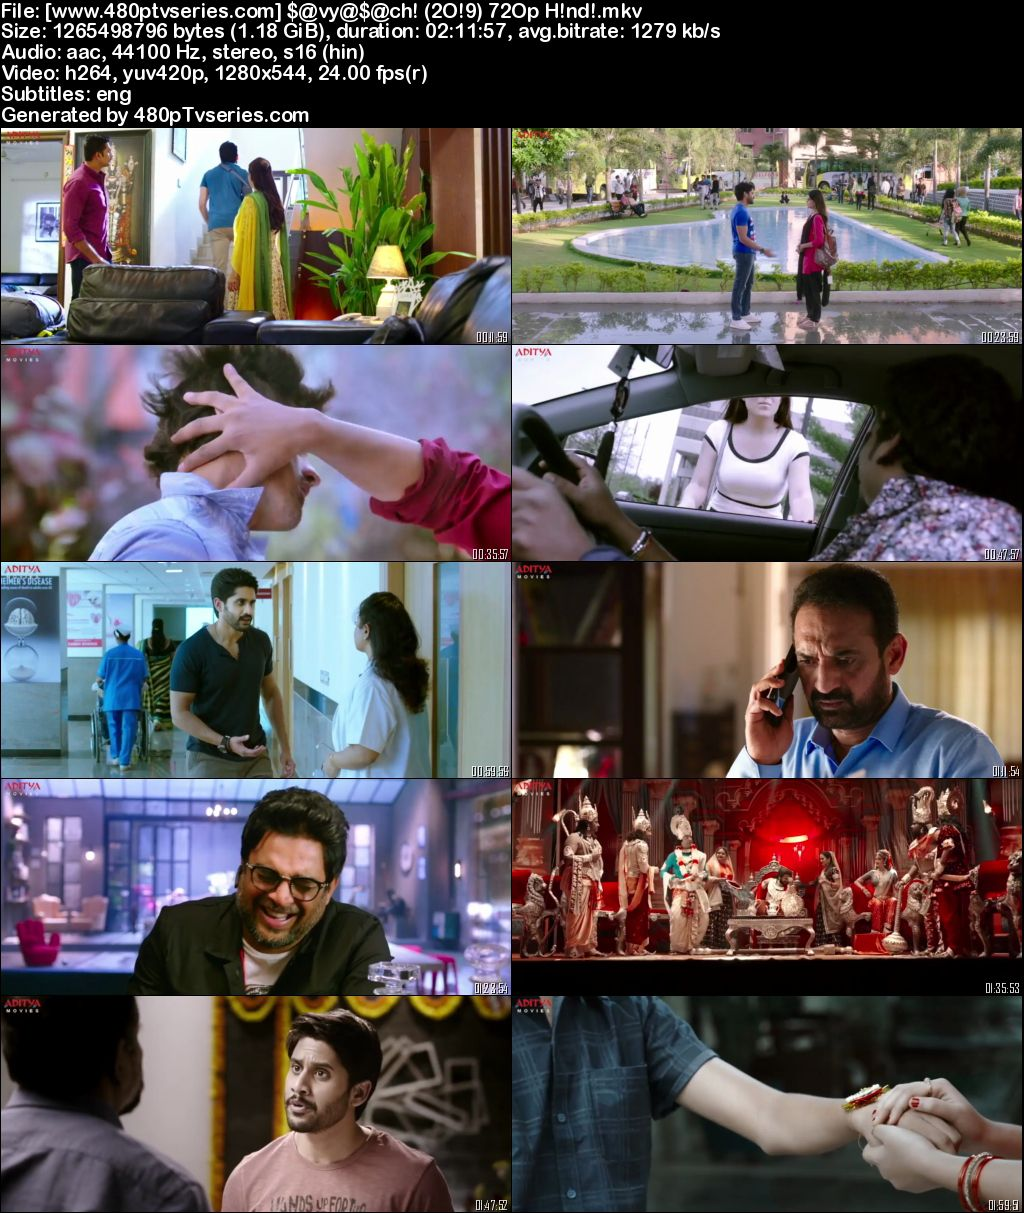 Savyasachi (2019) Full Hindi Dubbed Movie Download 480p 720p HDRip Free Watch Online Full Movie Download Worldfree4u 9xmovies